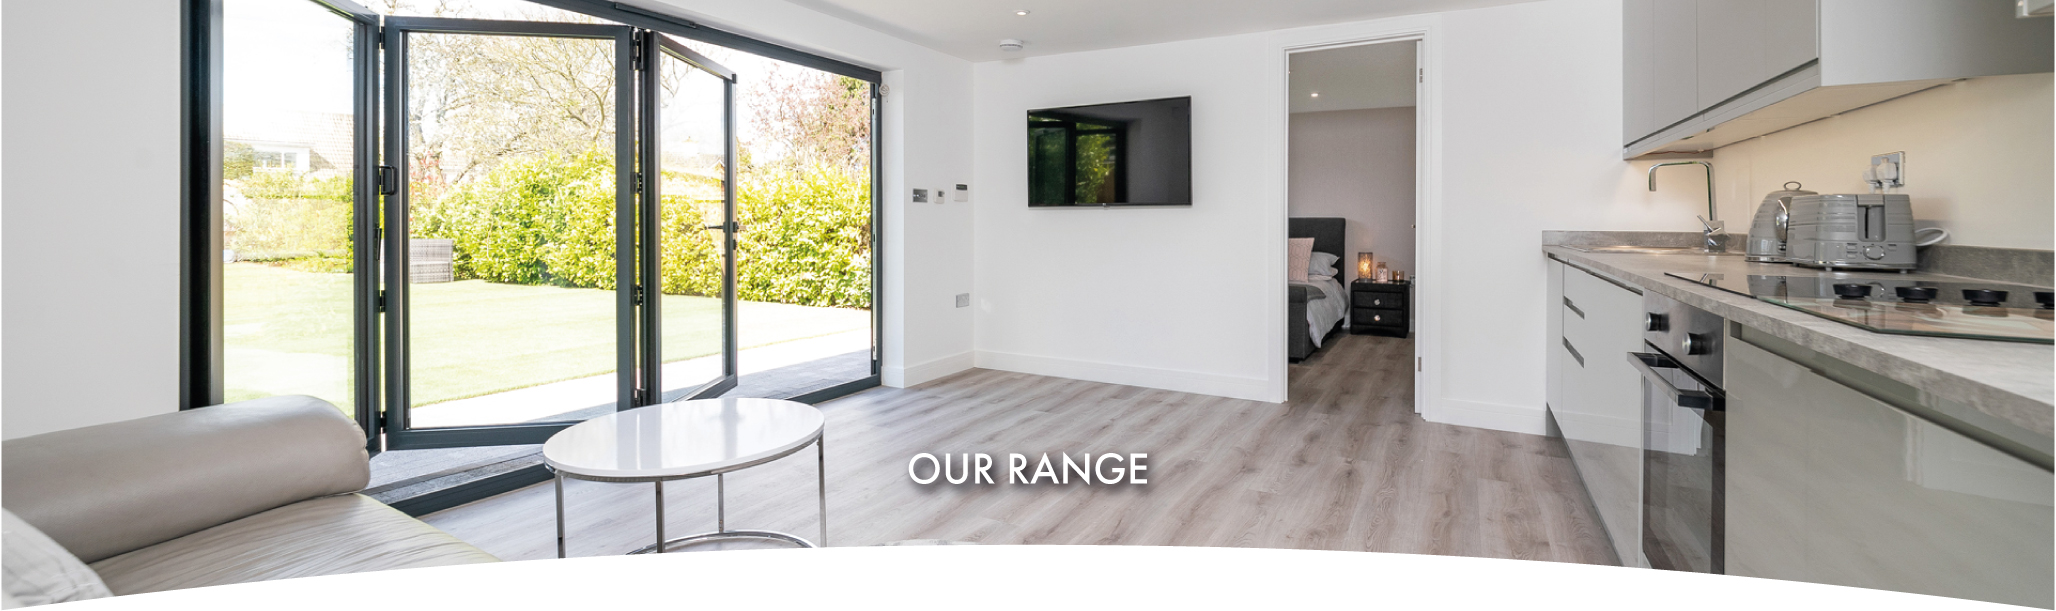 Garden Room and Garden Office range